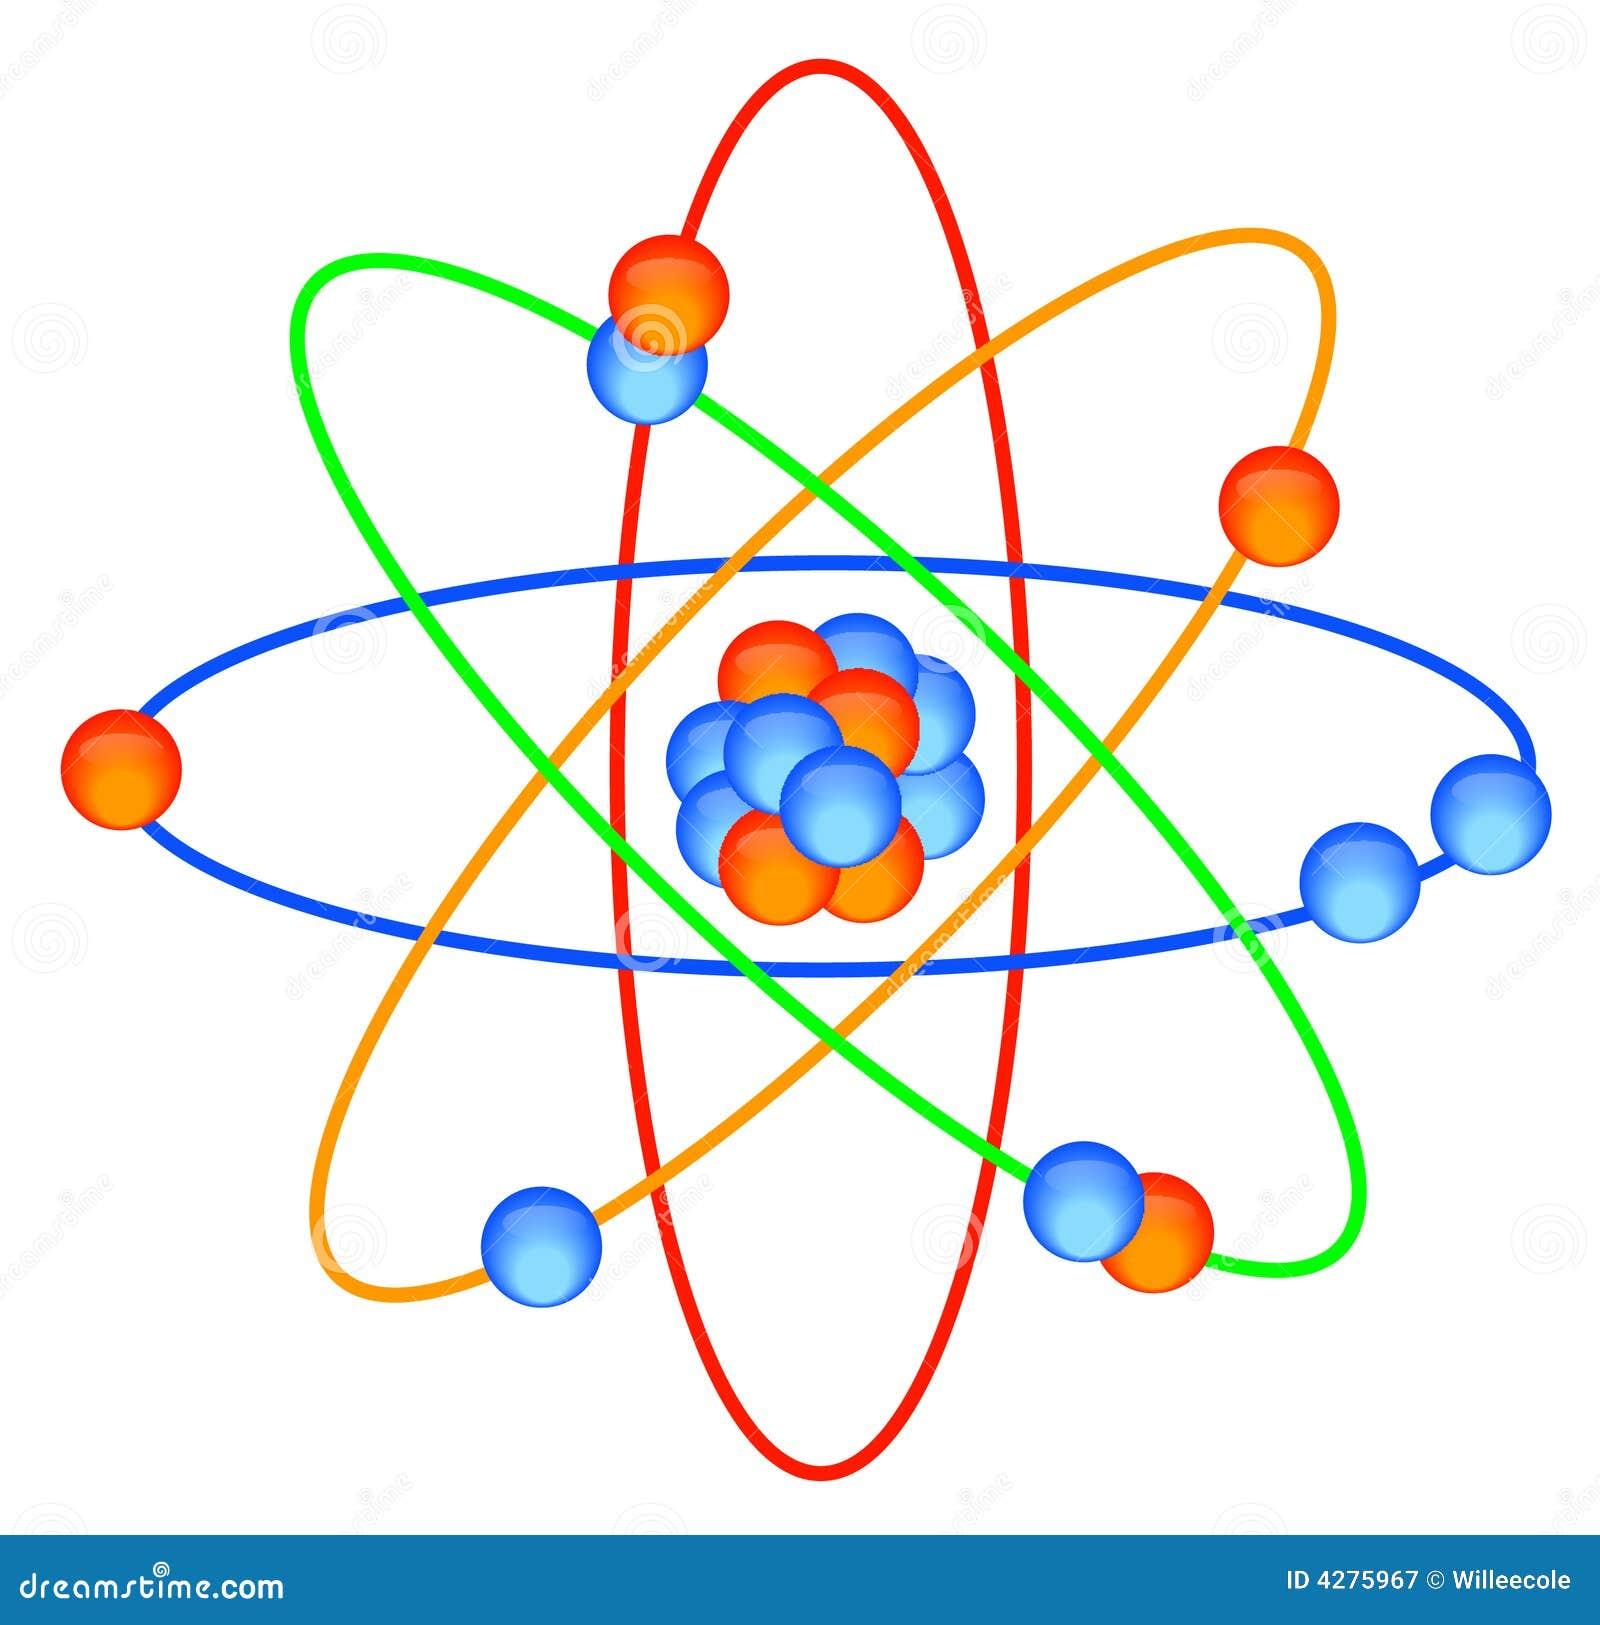 Moleculair atoomnet